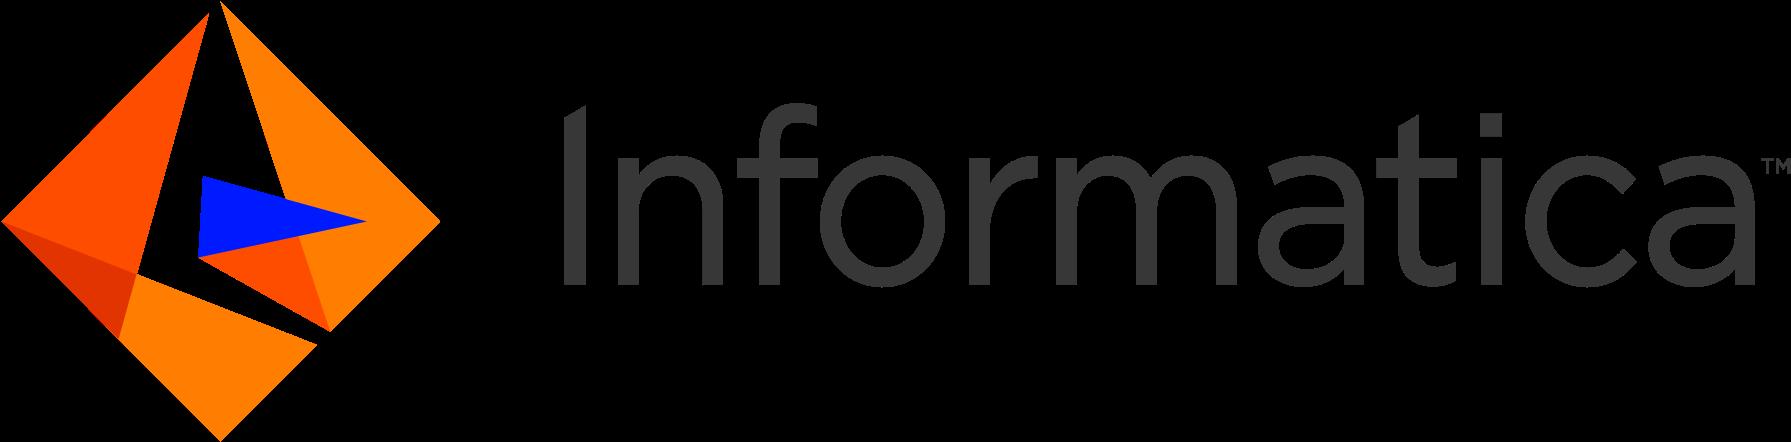 informatica-logo-png-transparent-png.png